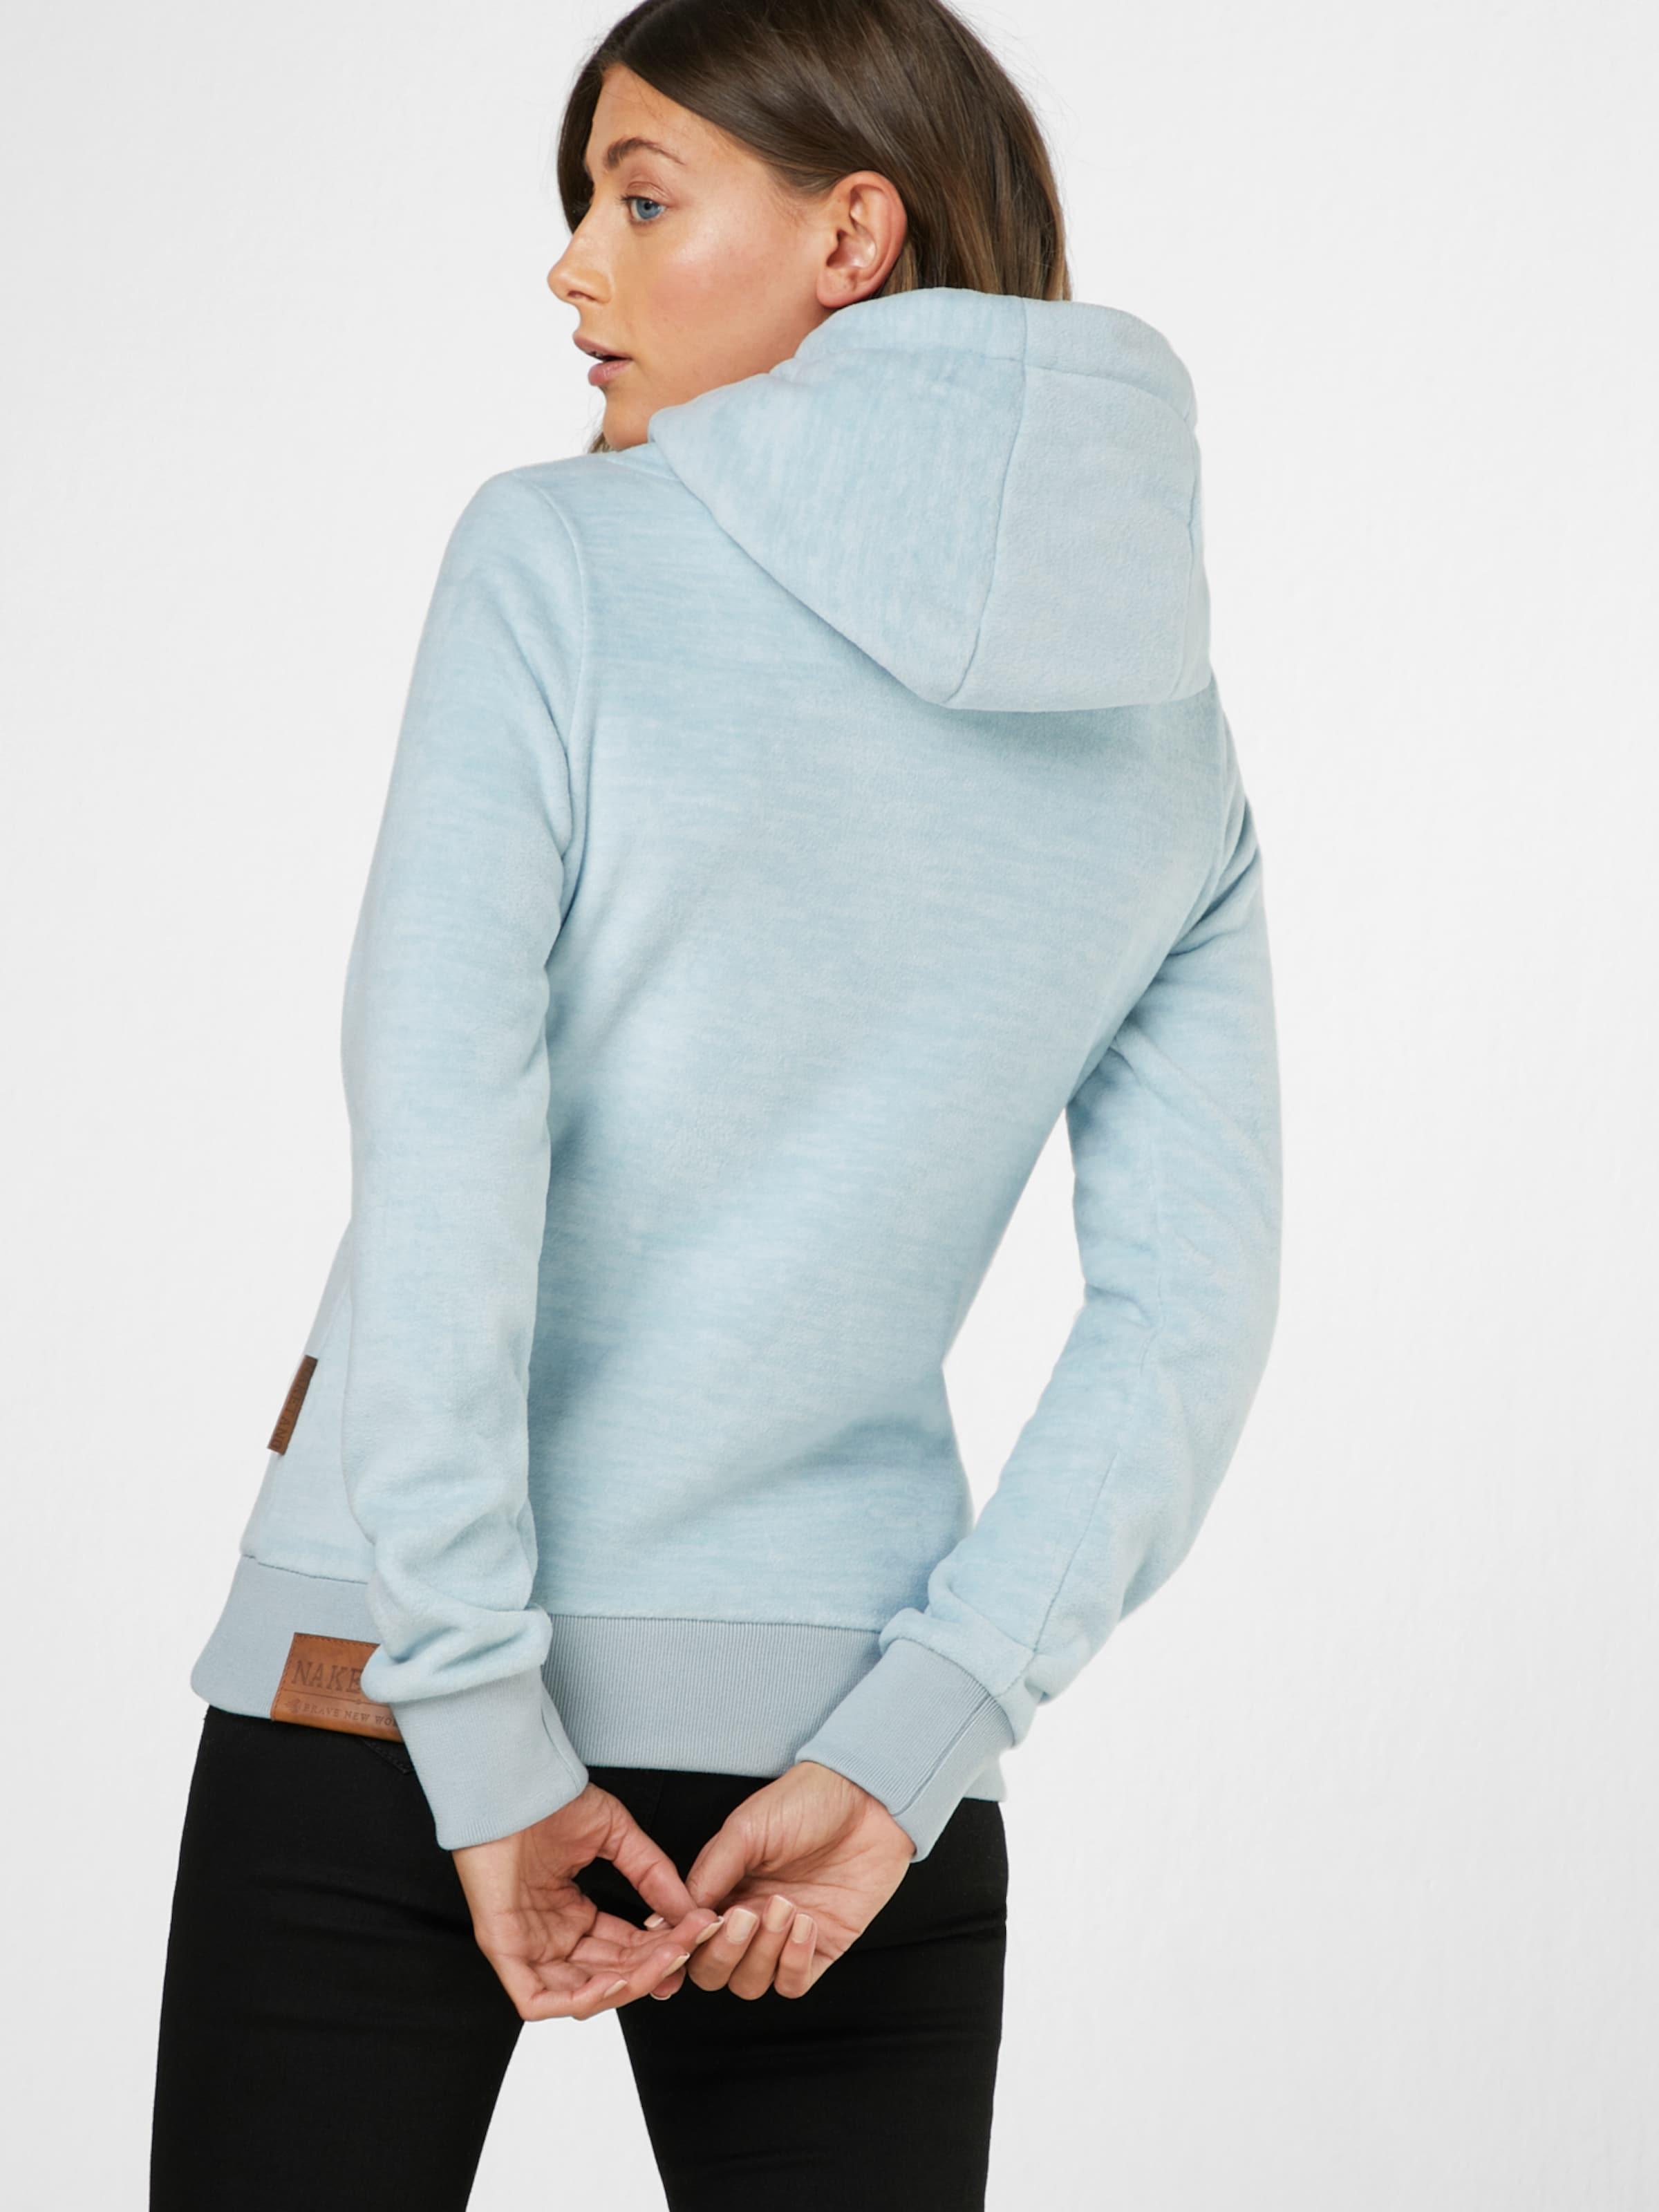 Bleu En shirt 'kanisterkopf' Naketano Clair Sweat nOkP80w